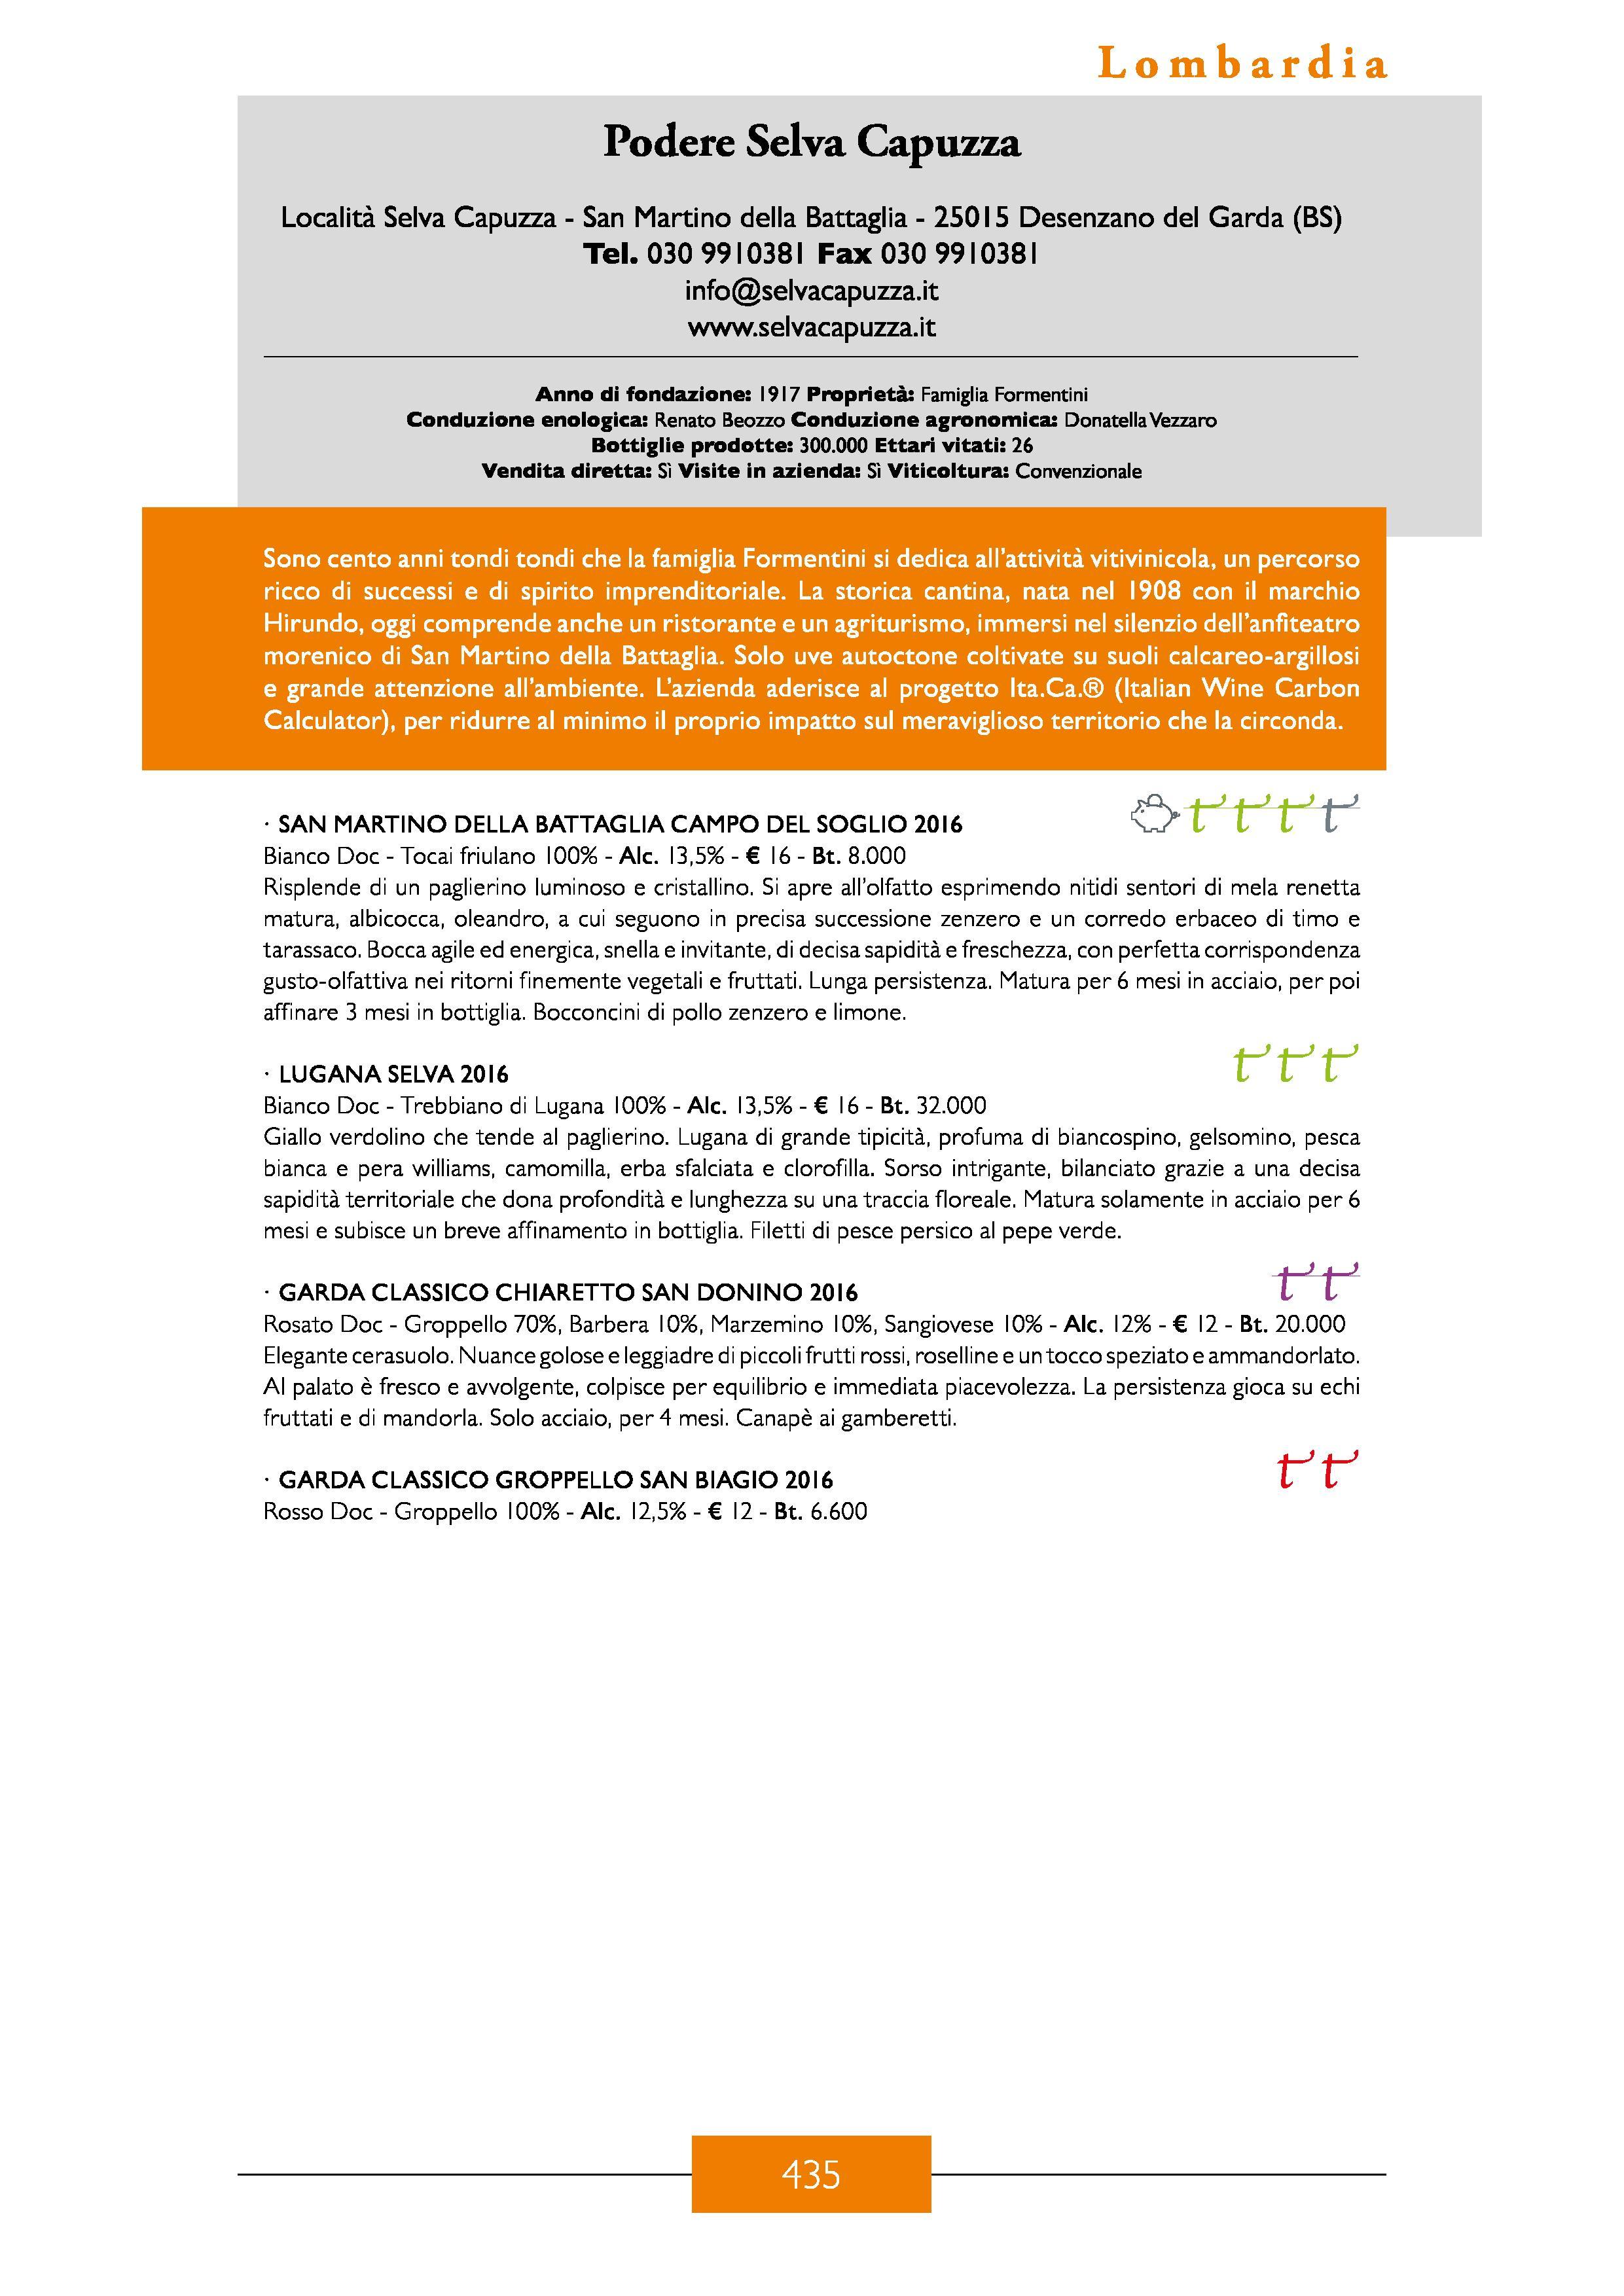 Guida_Vitae_2018_pag 435.jpg